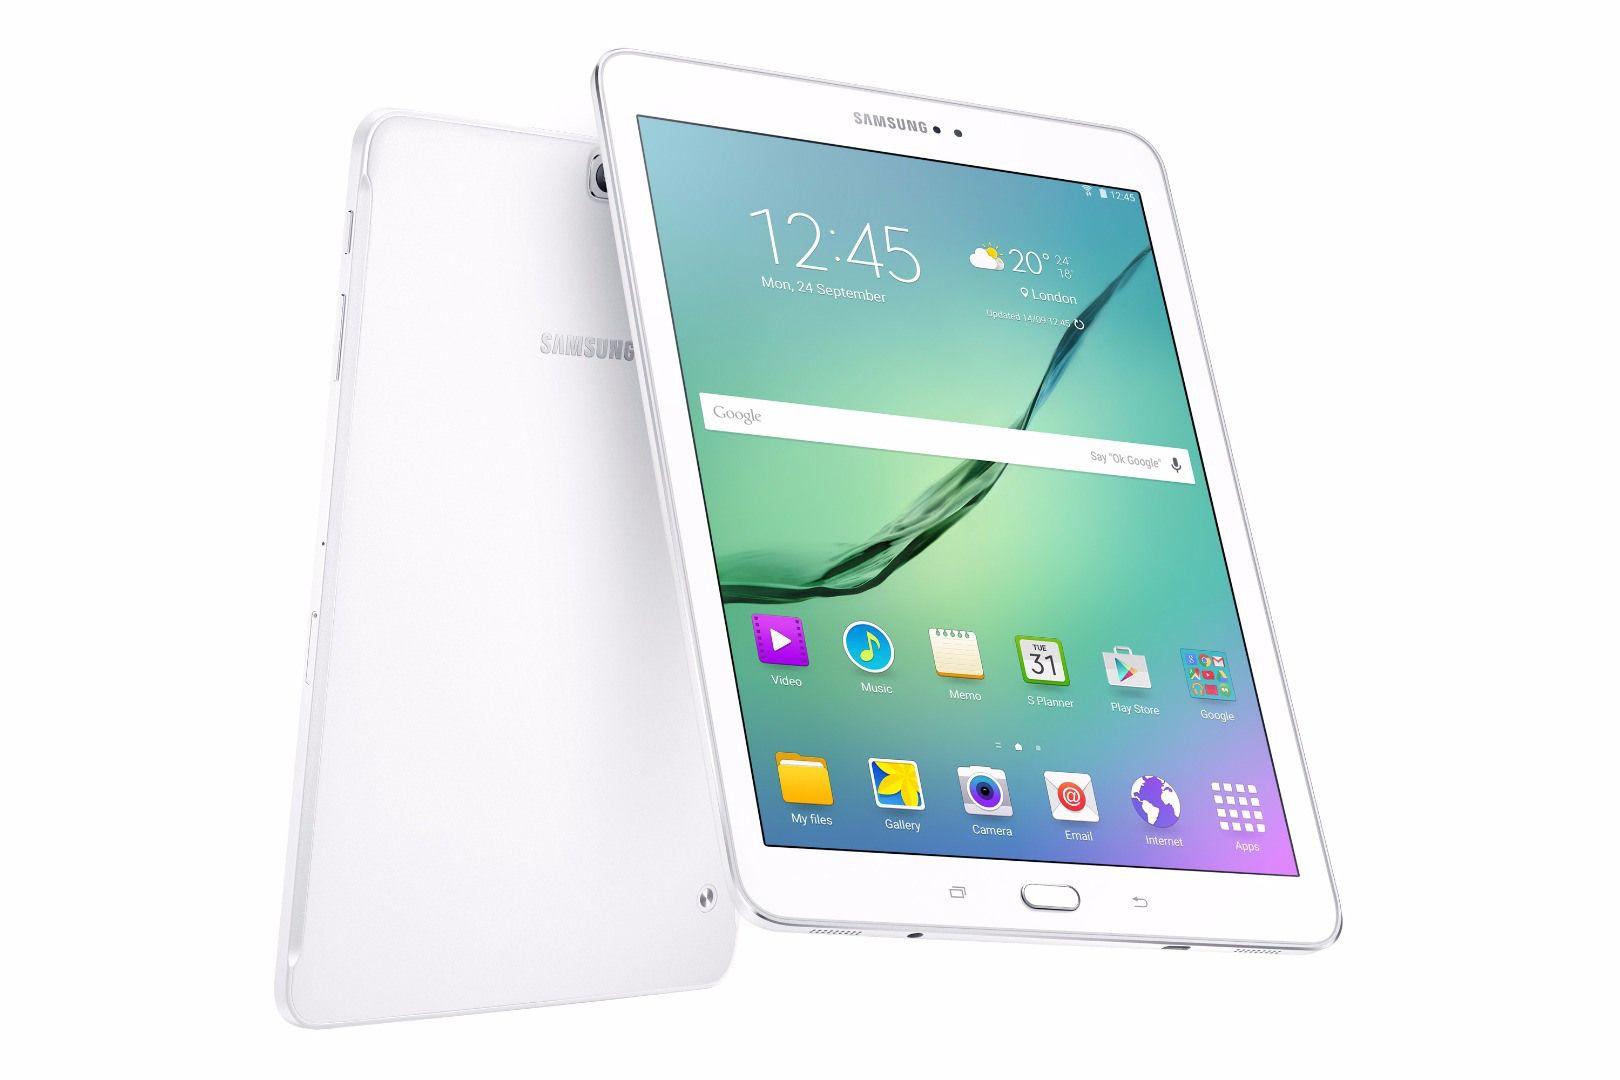 Samsung Annonce Le Galaxy Tab S2 8 0 Et 9 7 Pouces Samsung Galaxy Tablette Galaxy